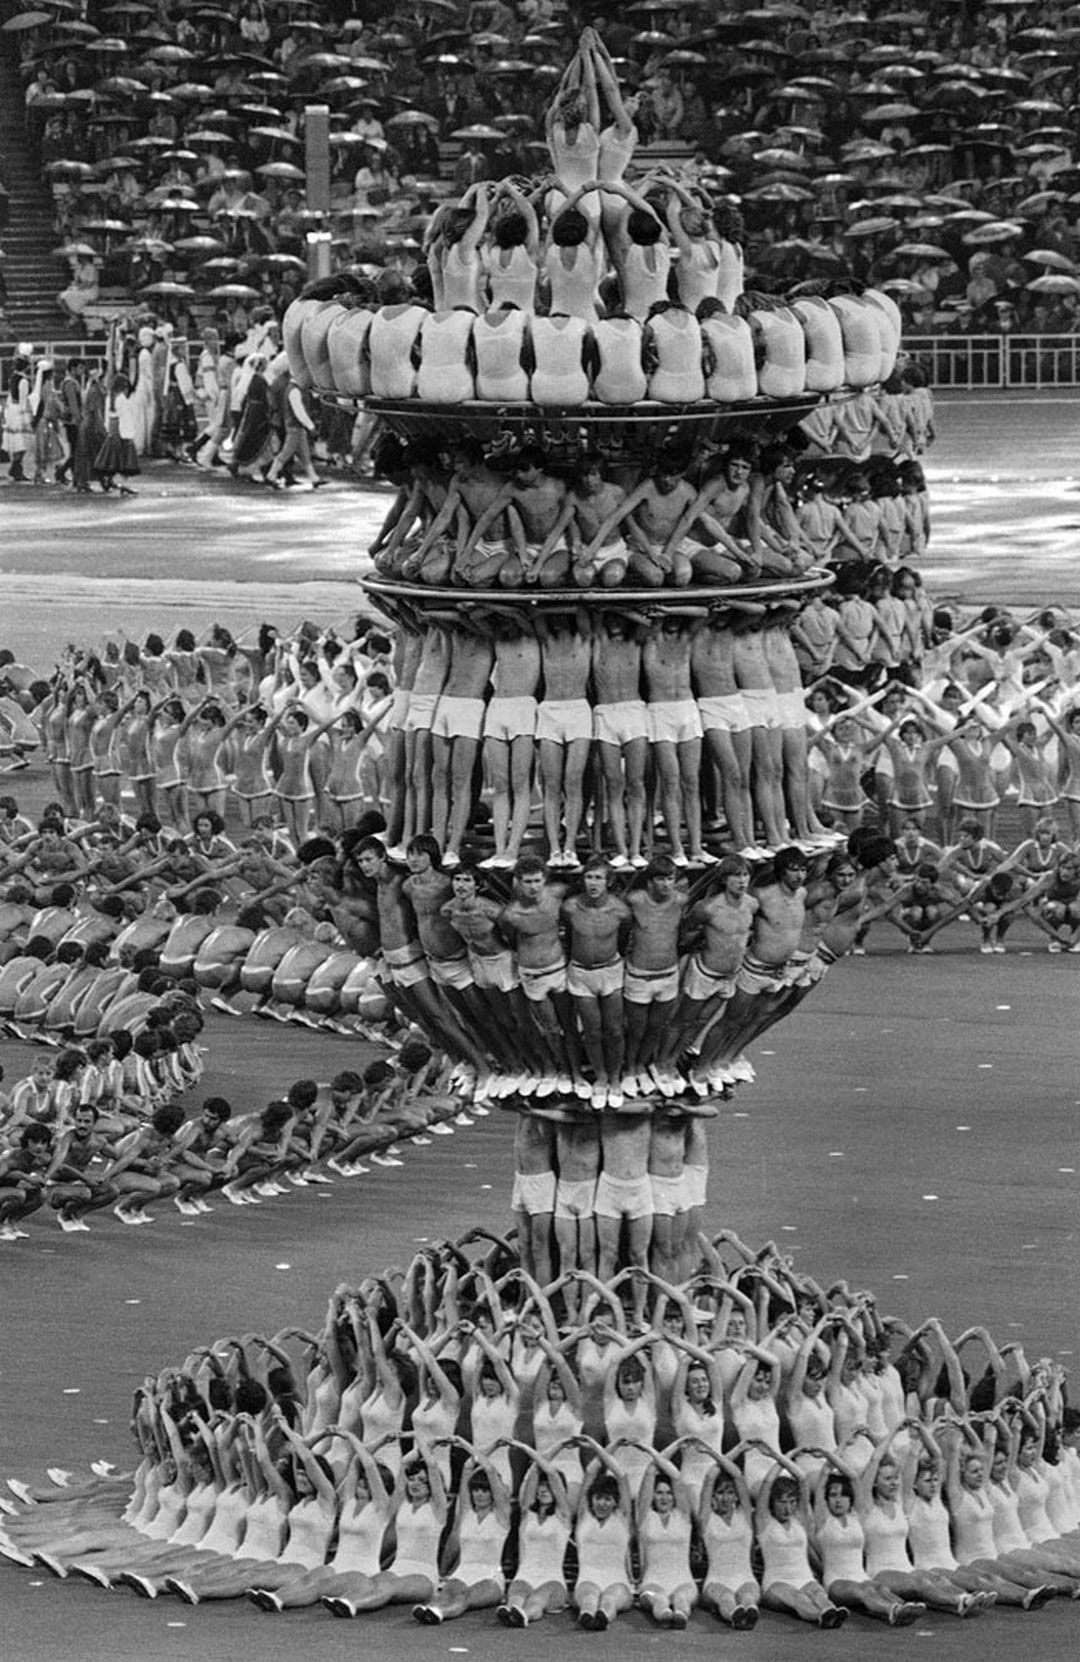 Церемония открытия Олимпийских игр, Москва, 1980